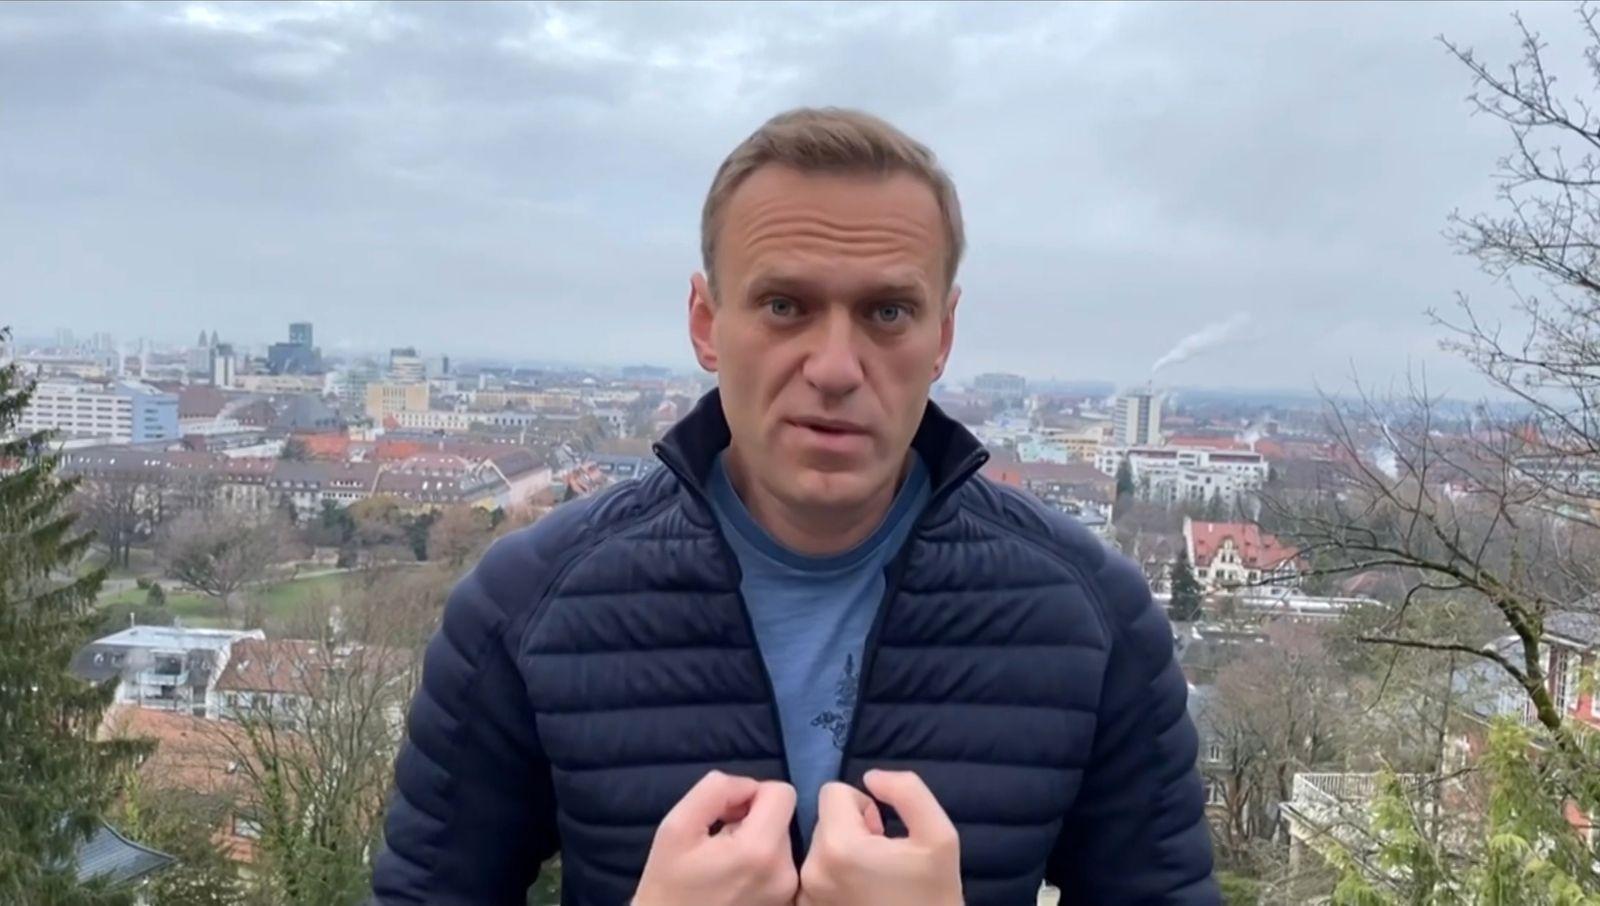 GERMANY-RUSSIA-POLITICS-NAVALNY